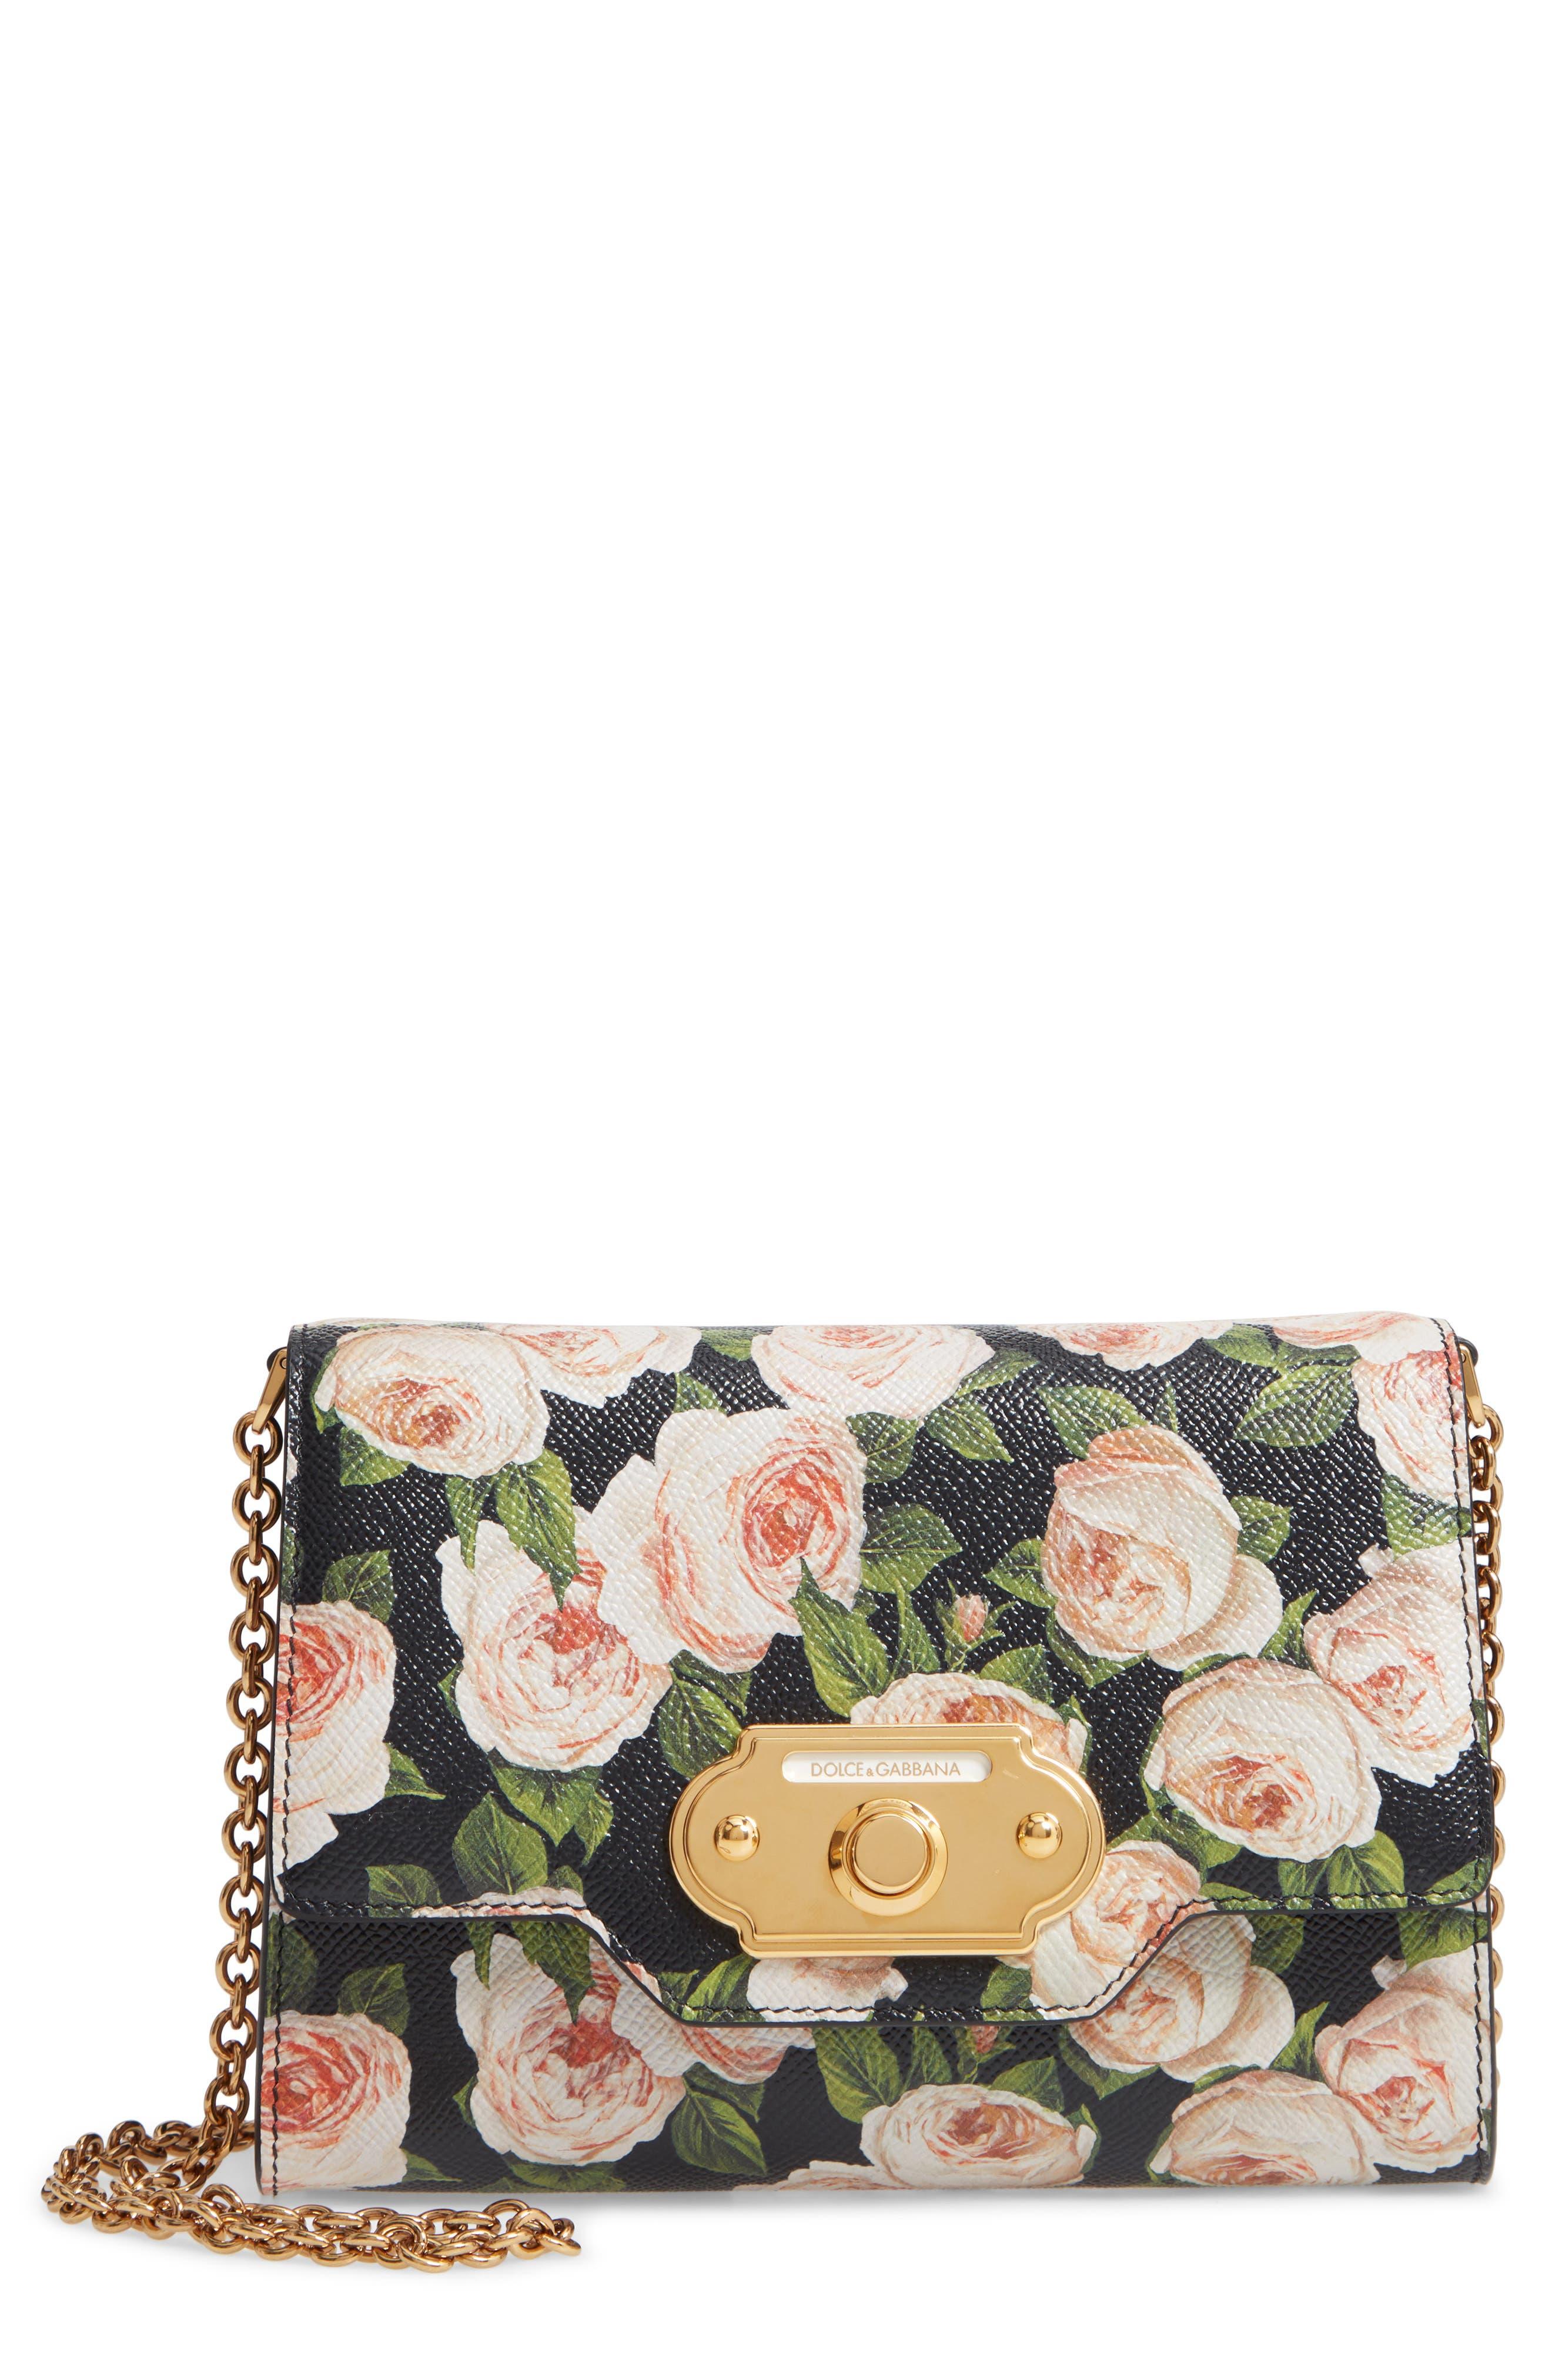 DOLCE&GABBANA, Rose Print Calfskin Leather Shoulder Bag, Main thumbnail 1, color, NERO/ ROSE